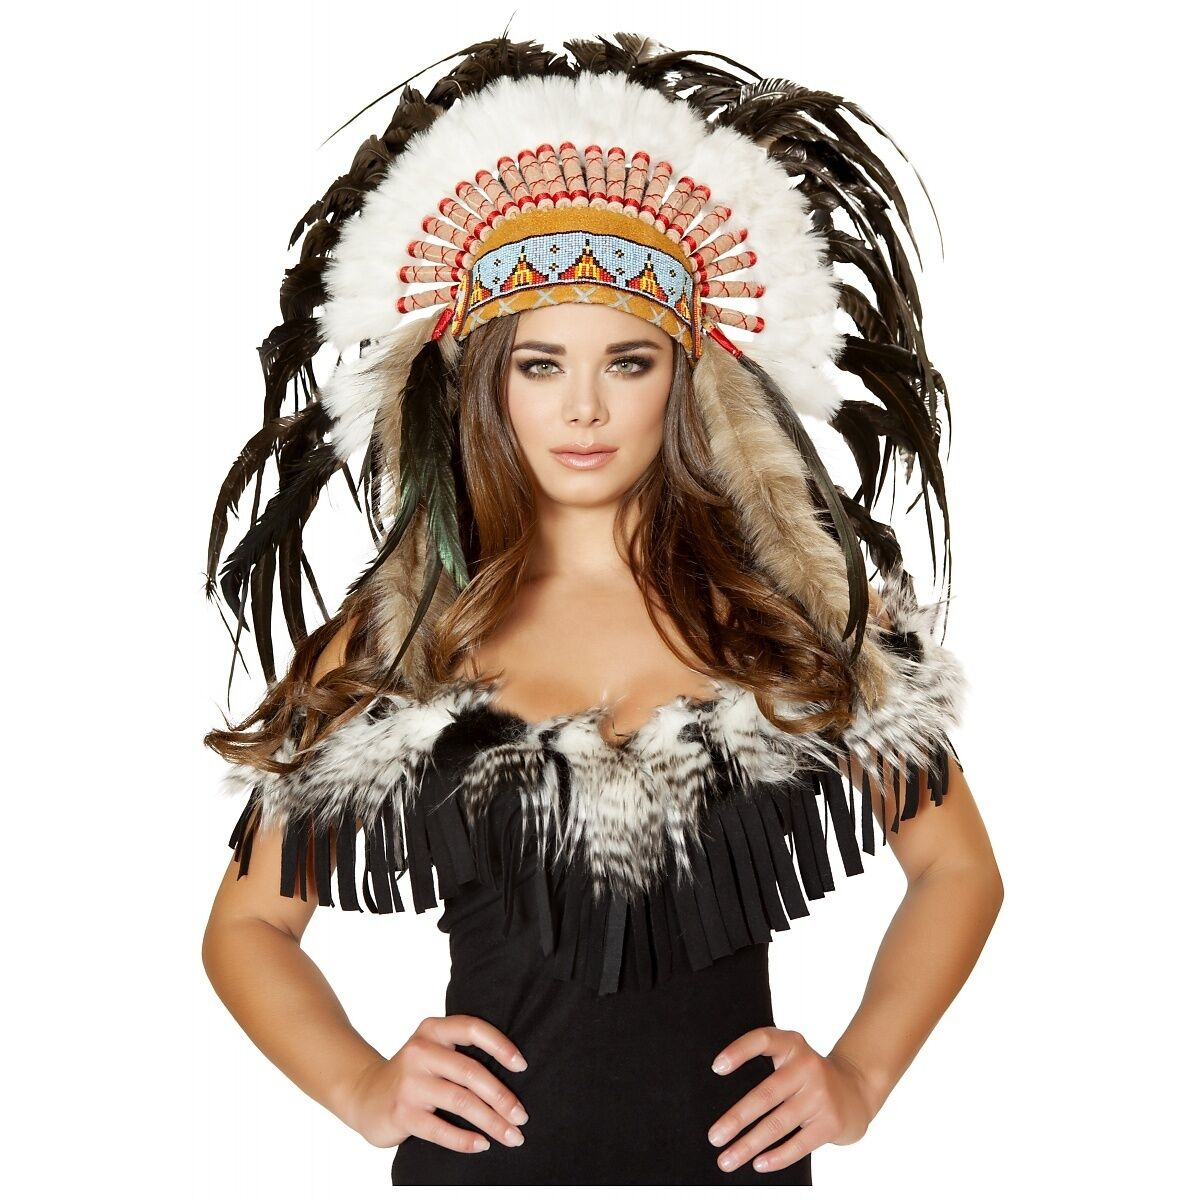 Picture 1 of 1  sc 1 st  eBay & Roma Costume USA H4471 Native American Headdress as SHOWN | eBay